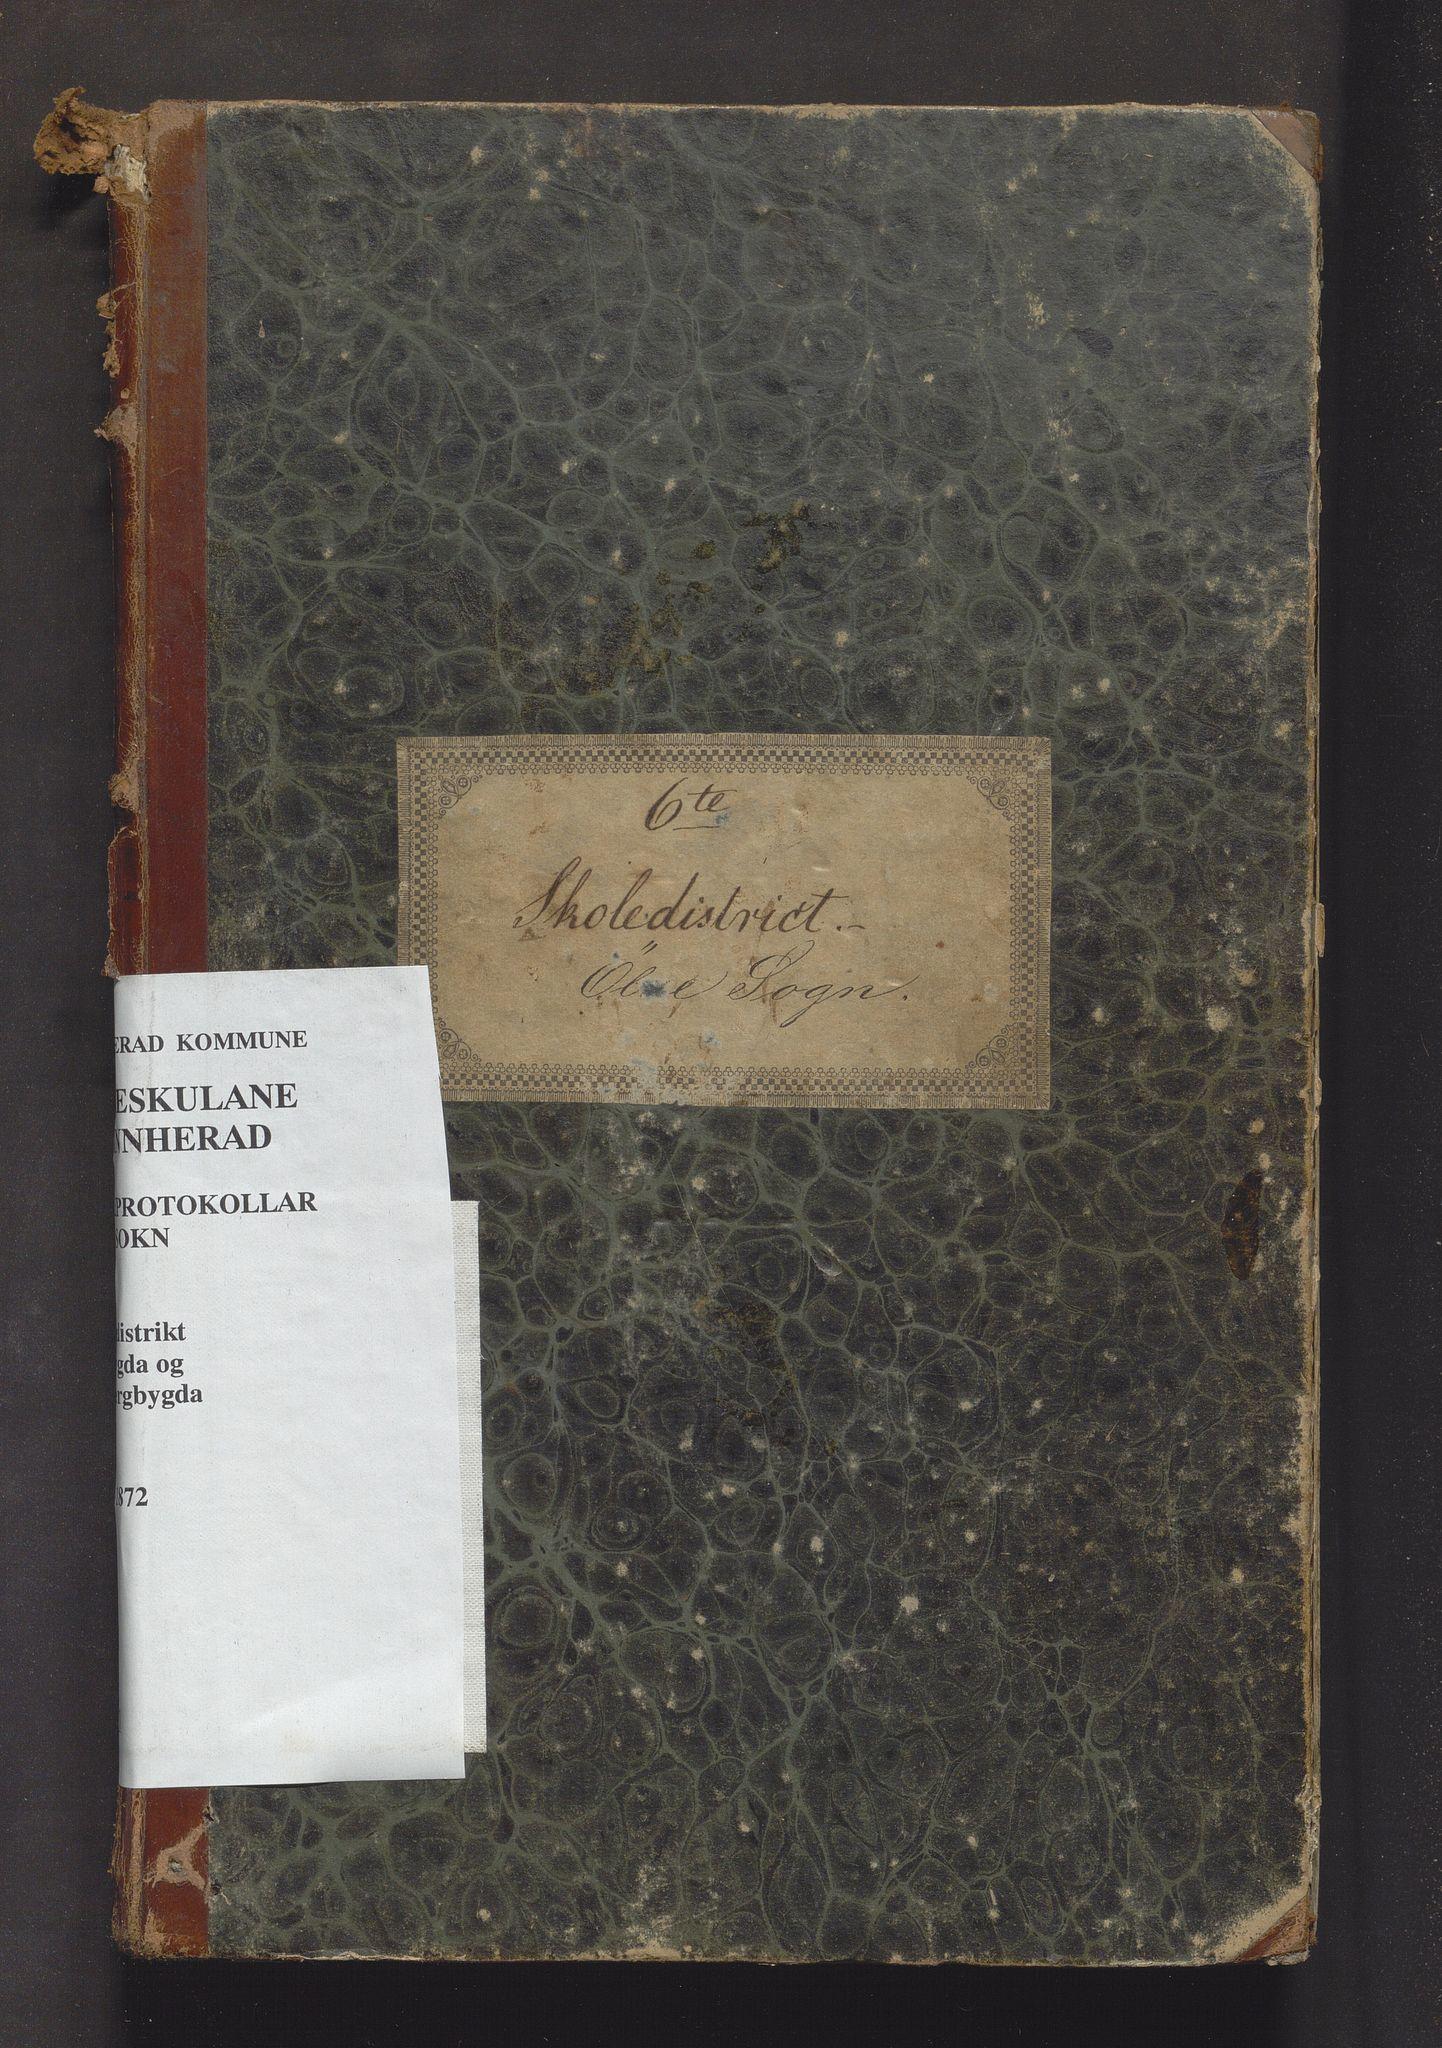 IKAH, Kvinnherad kommune. Barneskulane, F/Fb/L0001: Skuleprotokoll for Ølvesbygden og Fuglebergbygden i 6. skuledistrikt, 1846-1872